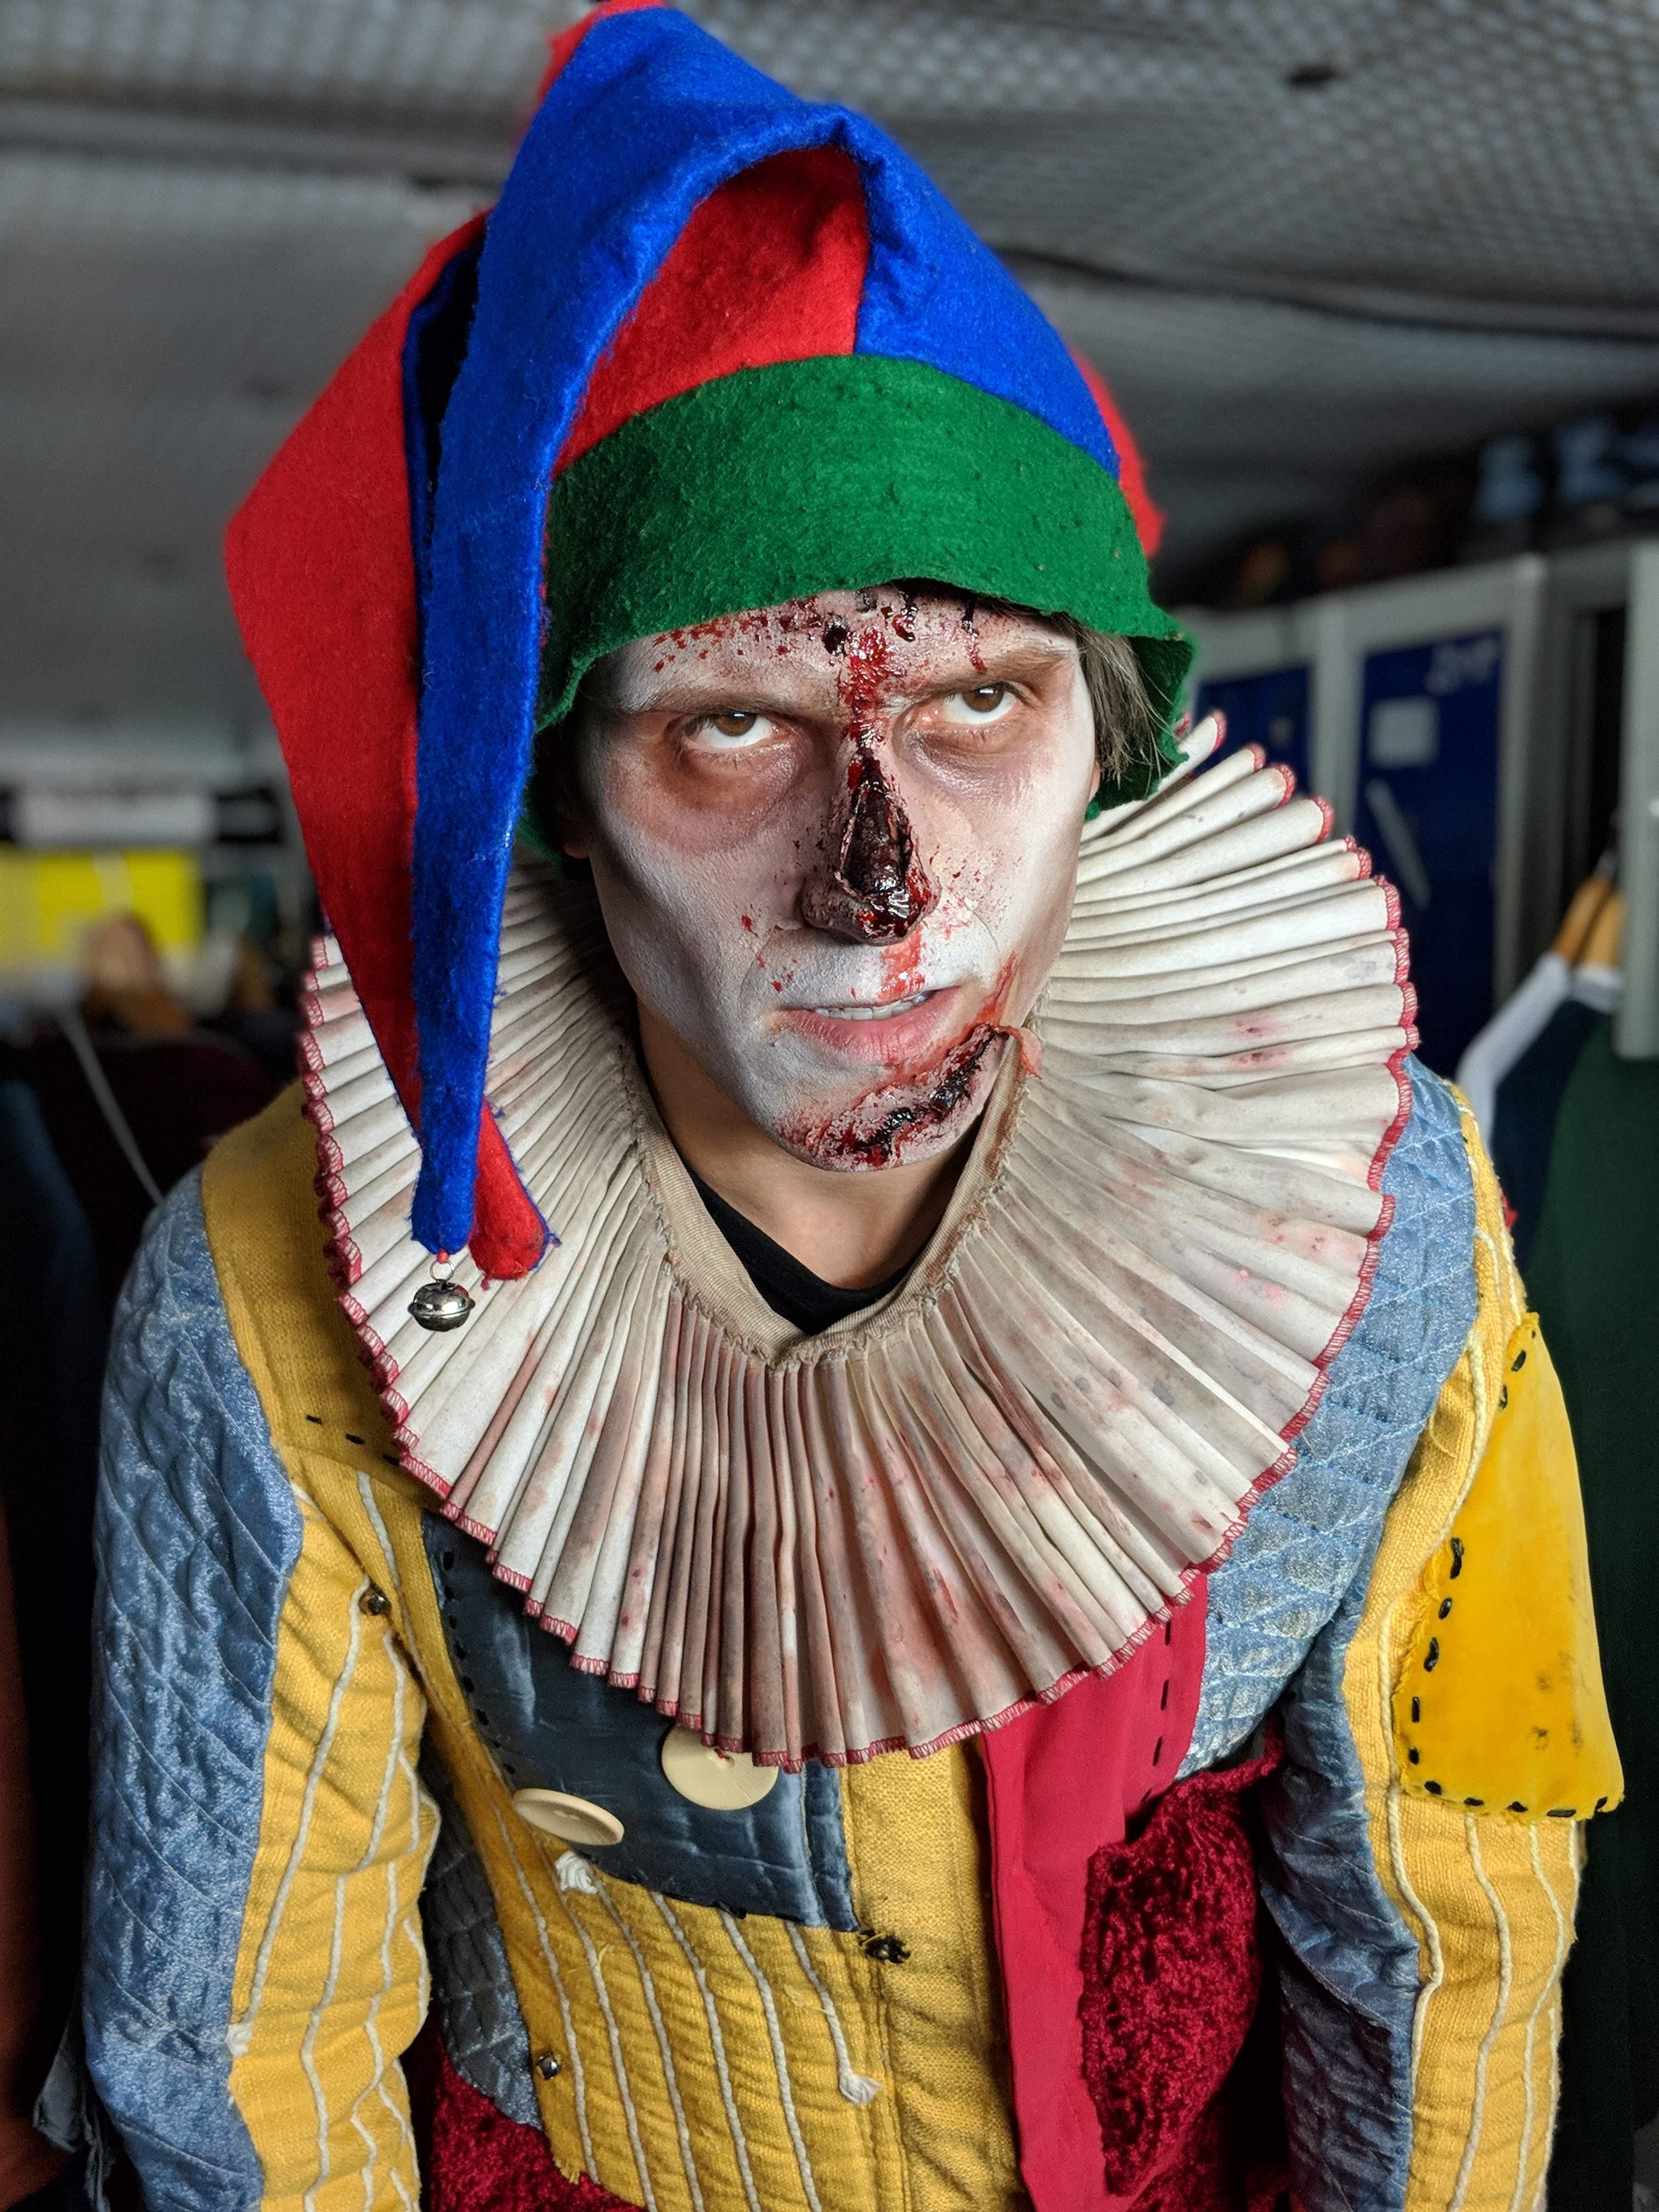 London Tombs - Steve as a zombie clown